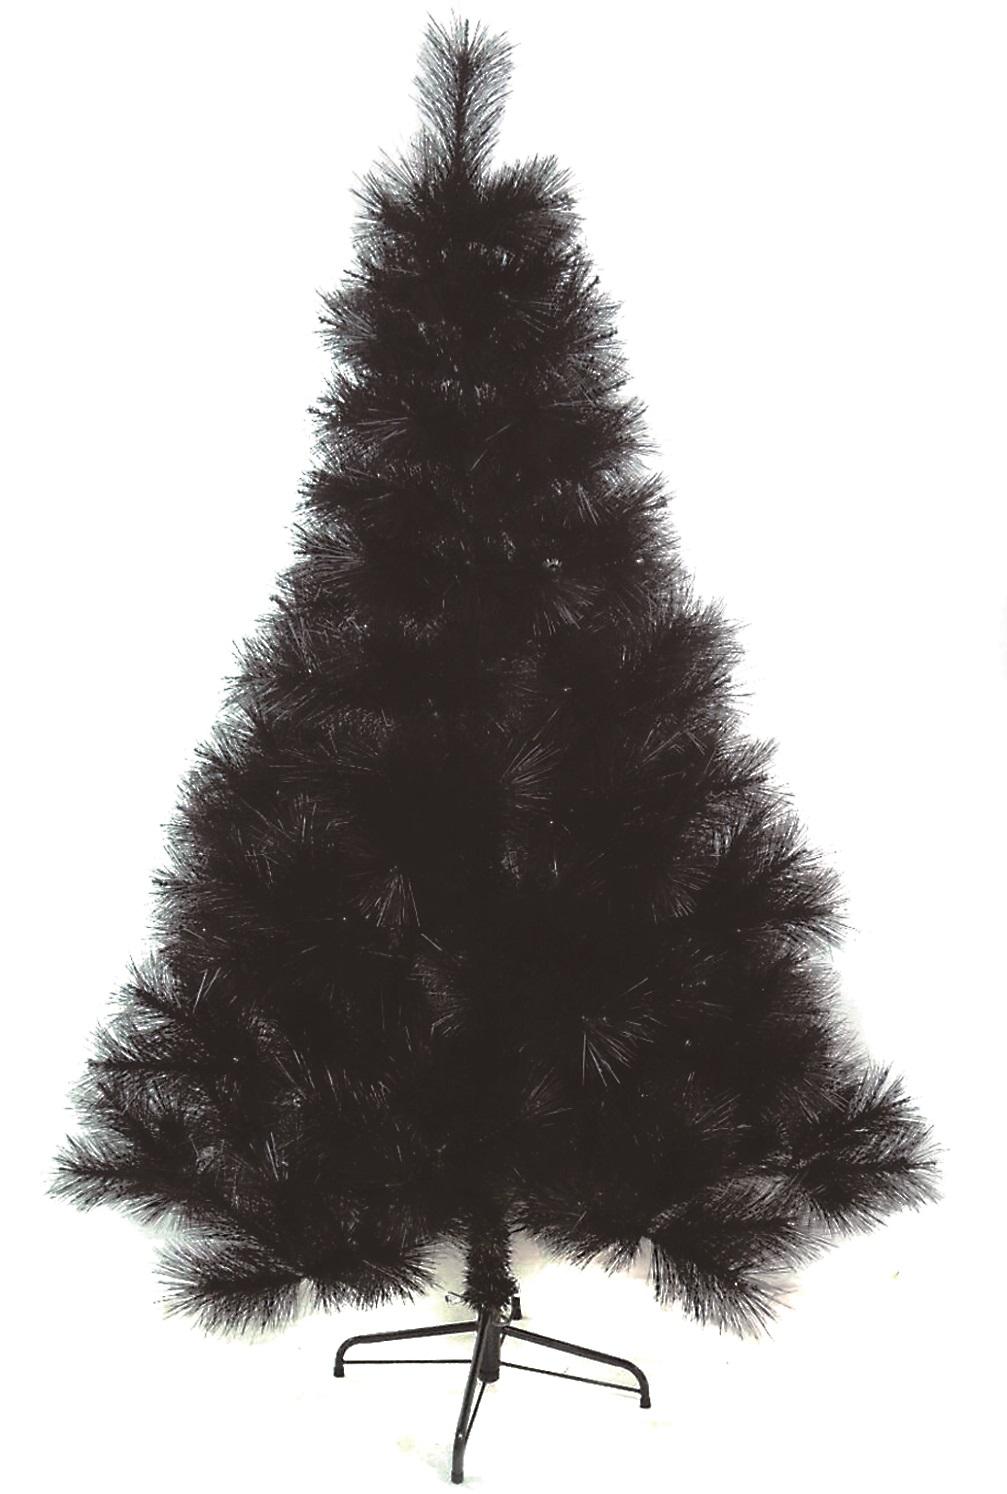 X射線【X020680】2尺聖誕松針樹(黑)(不含飾品、燈飾),聖誕樹/聖誕佈置/聖誕空樹/聖誕造景